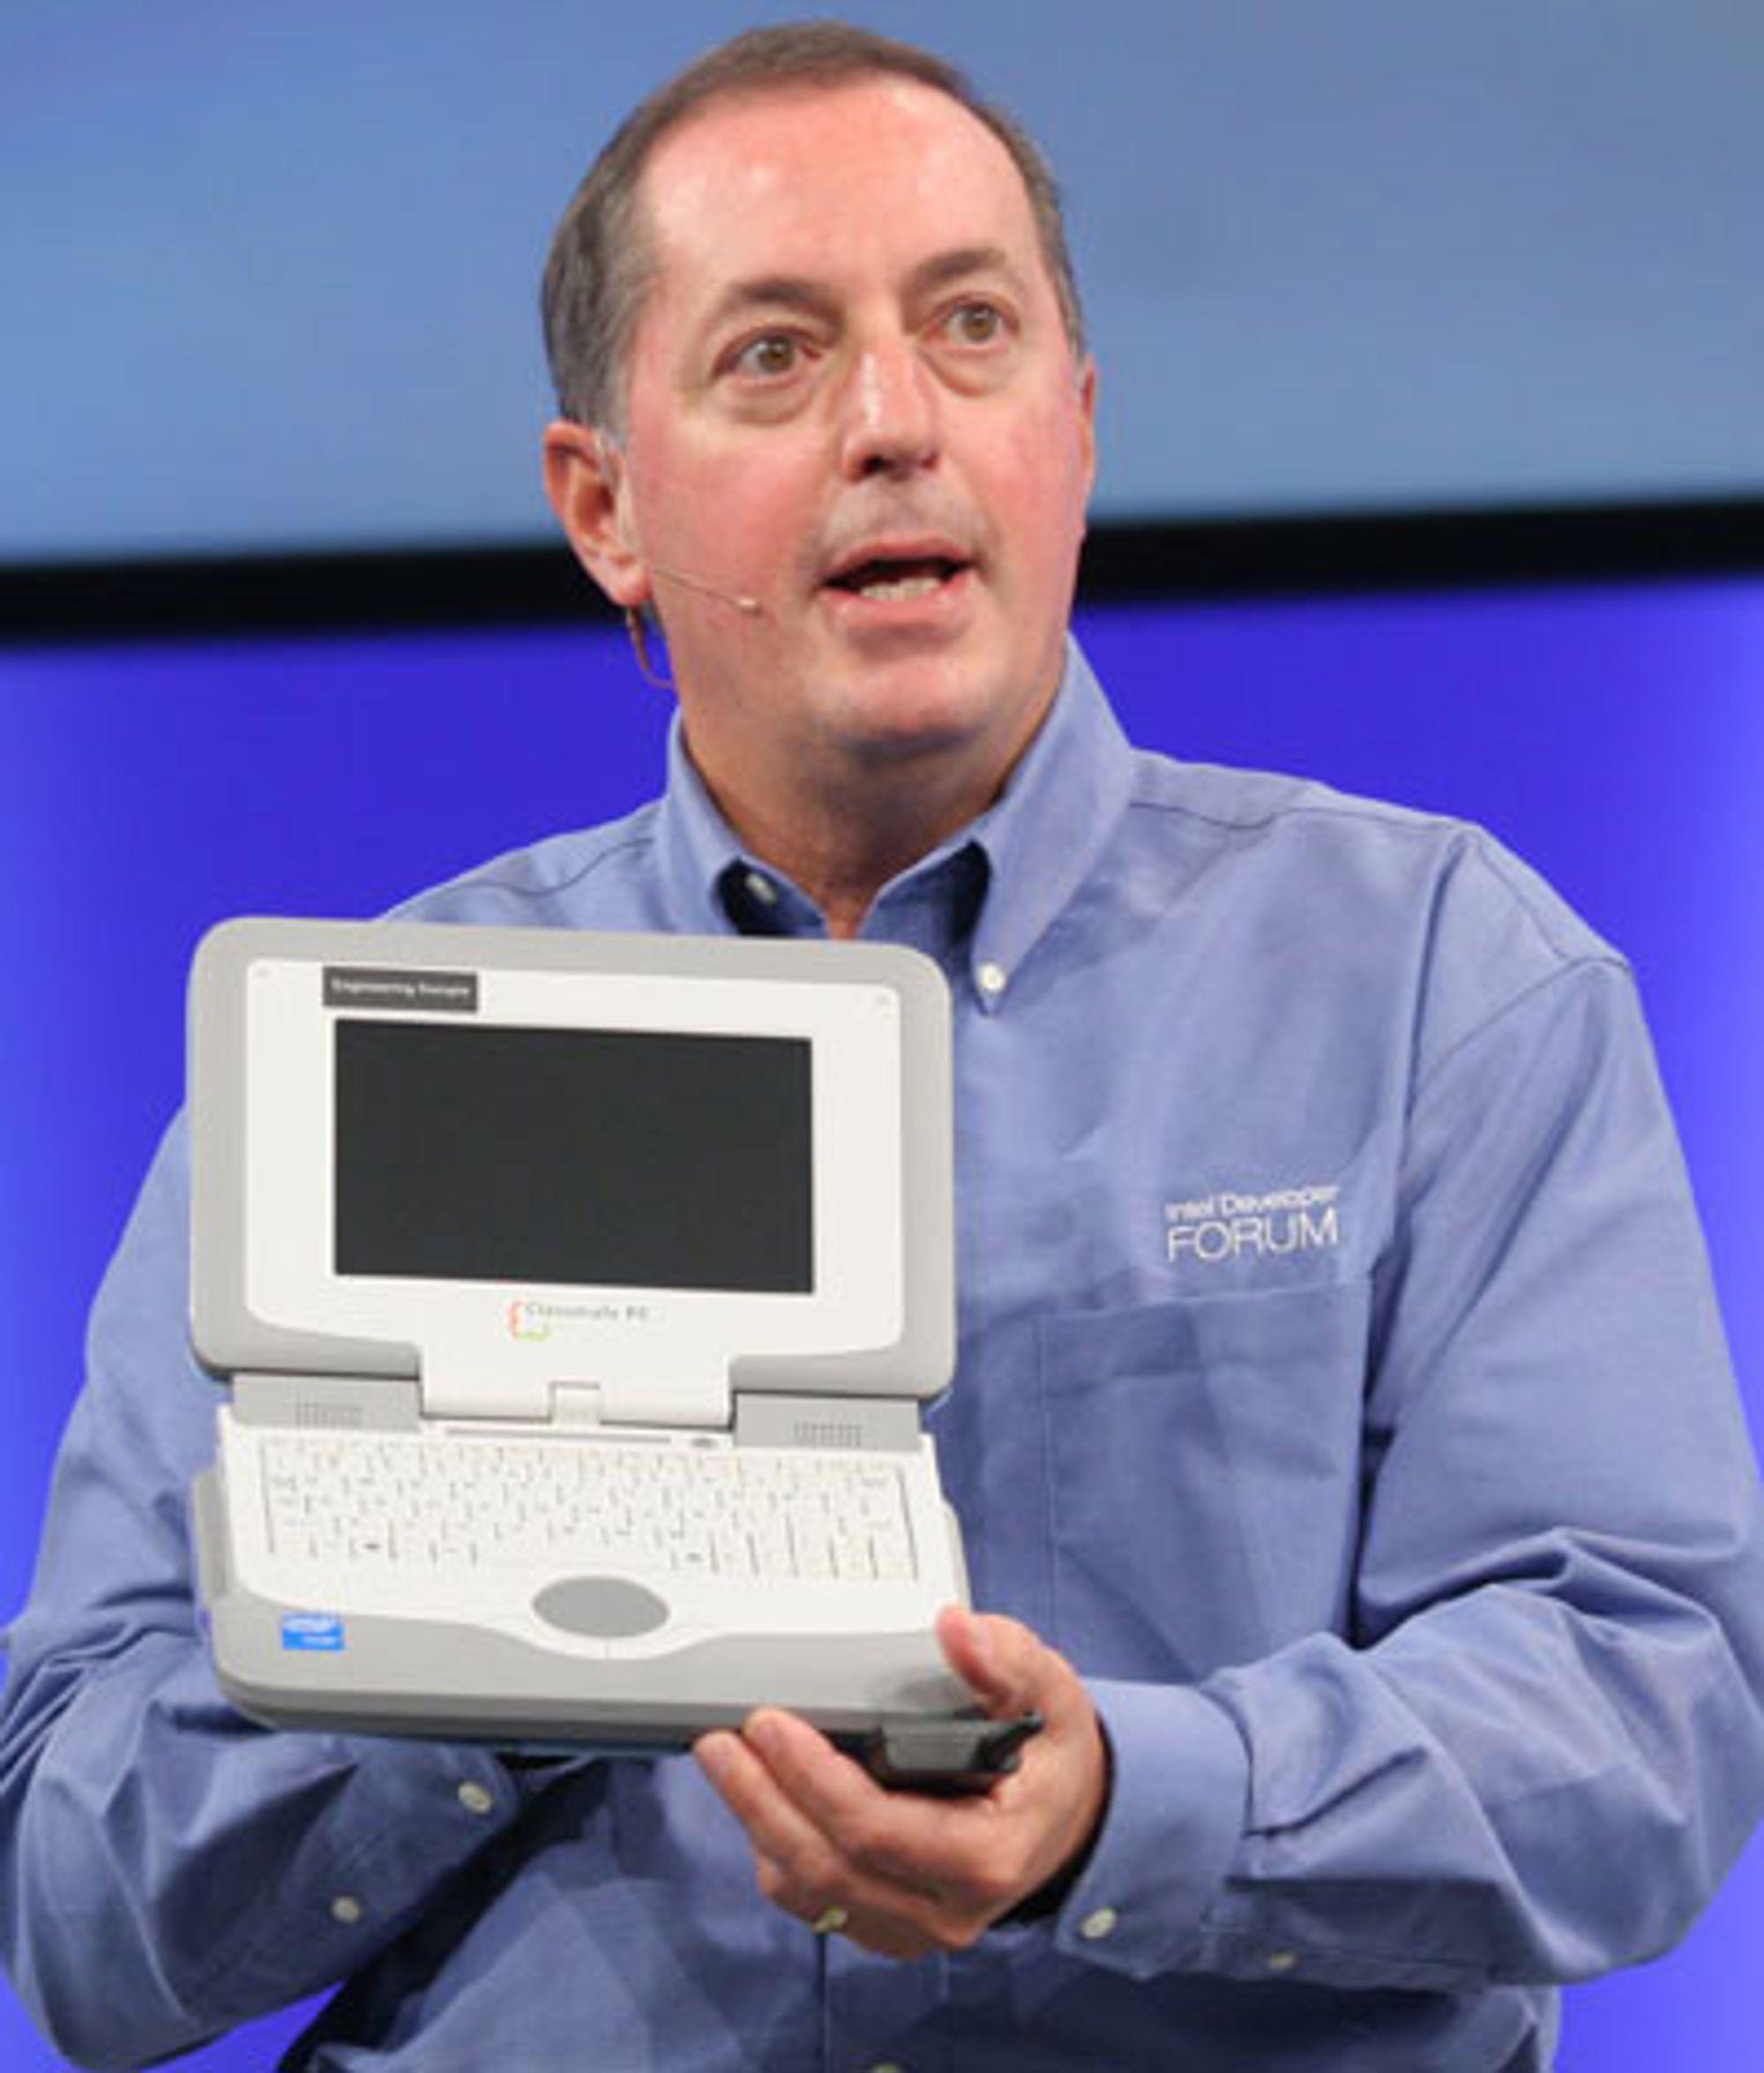 Intels Classmate-PC